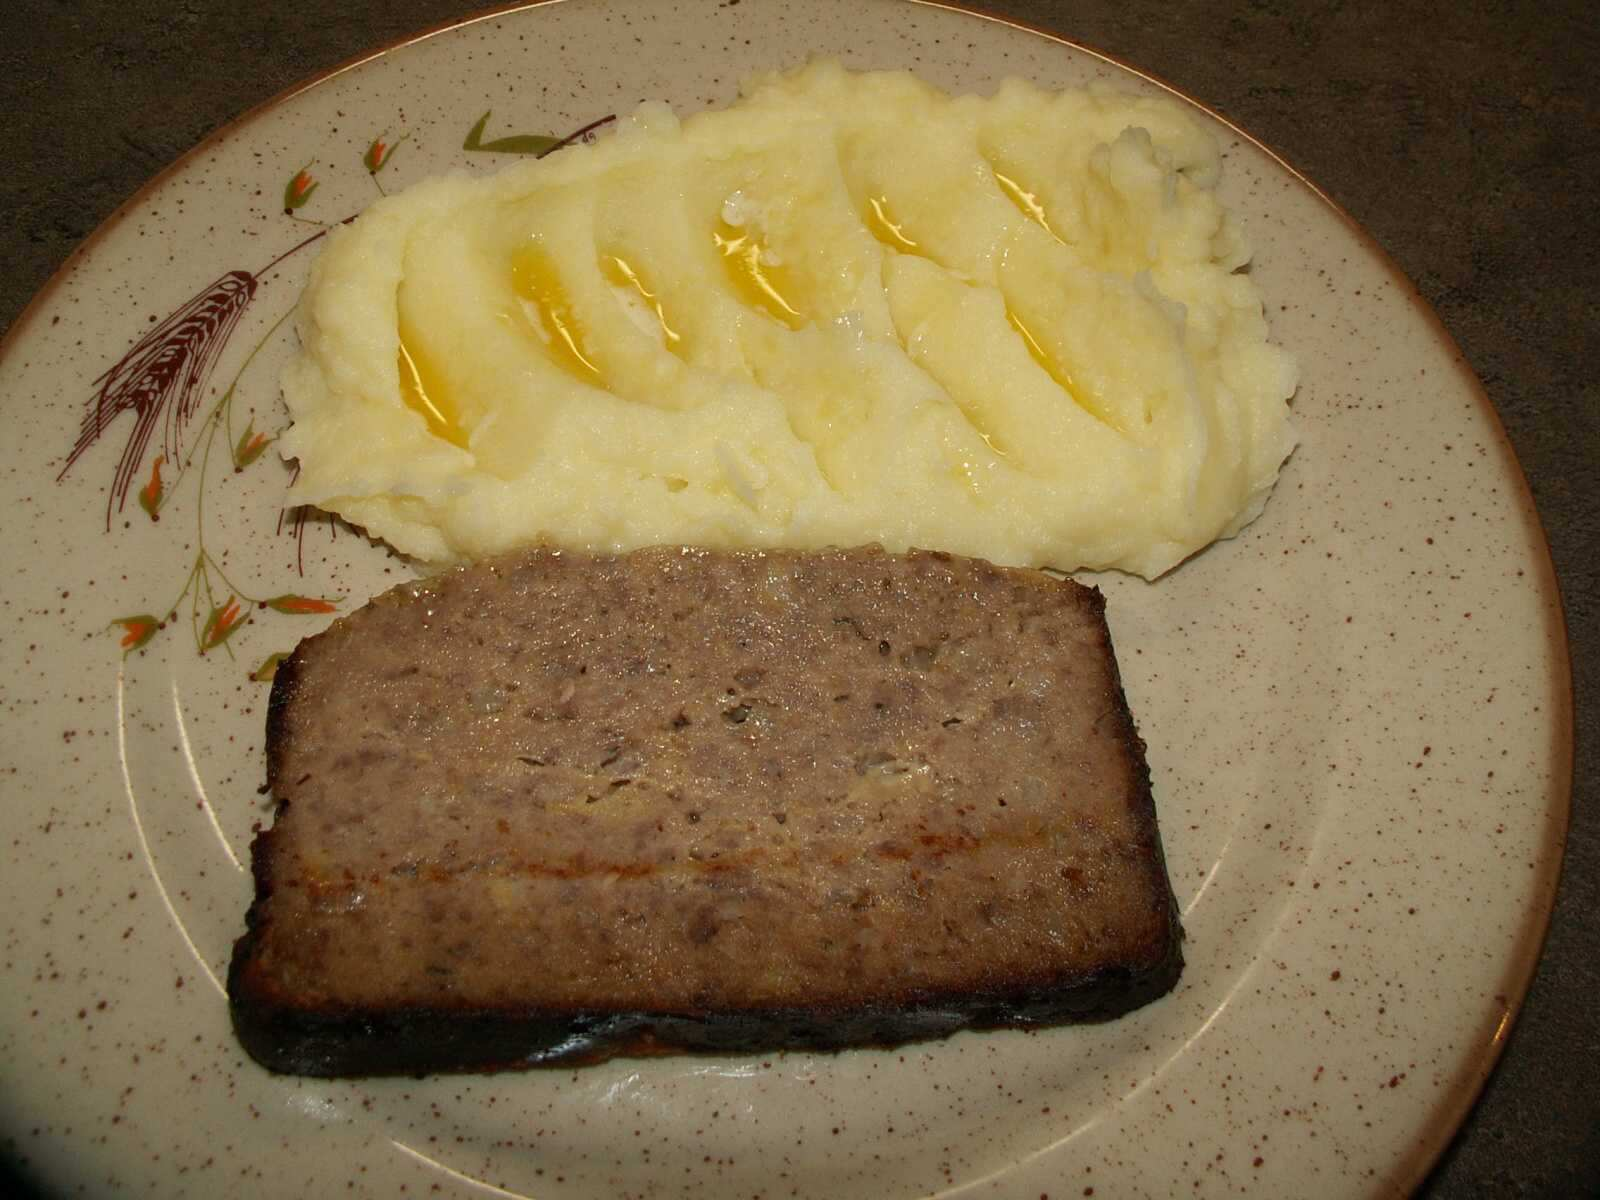 Recept Pavlíkova sekaná z pekárny - Sekaná s kaší.